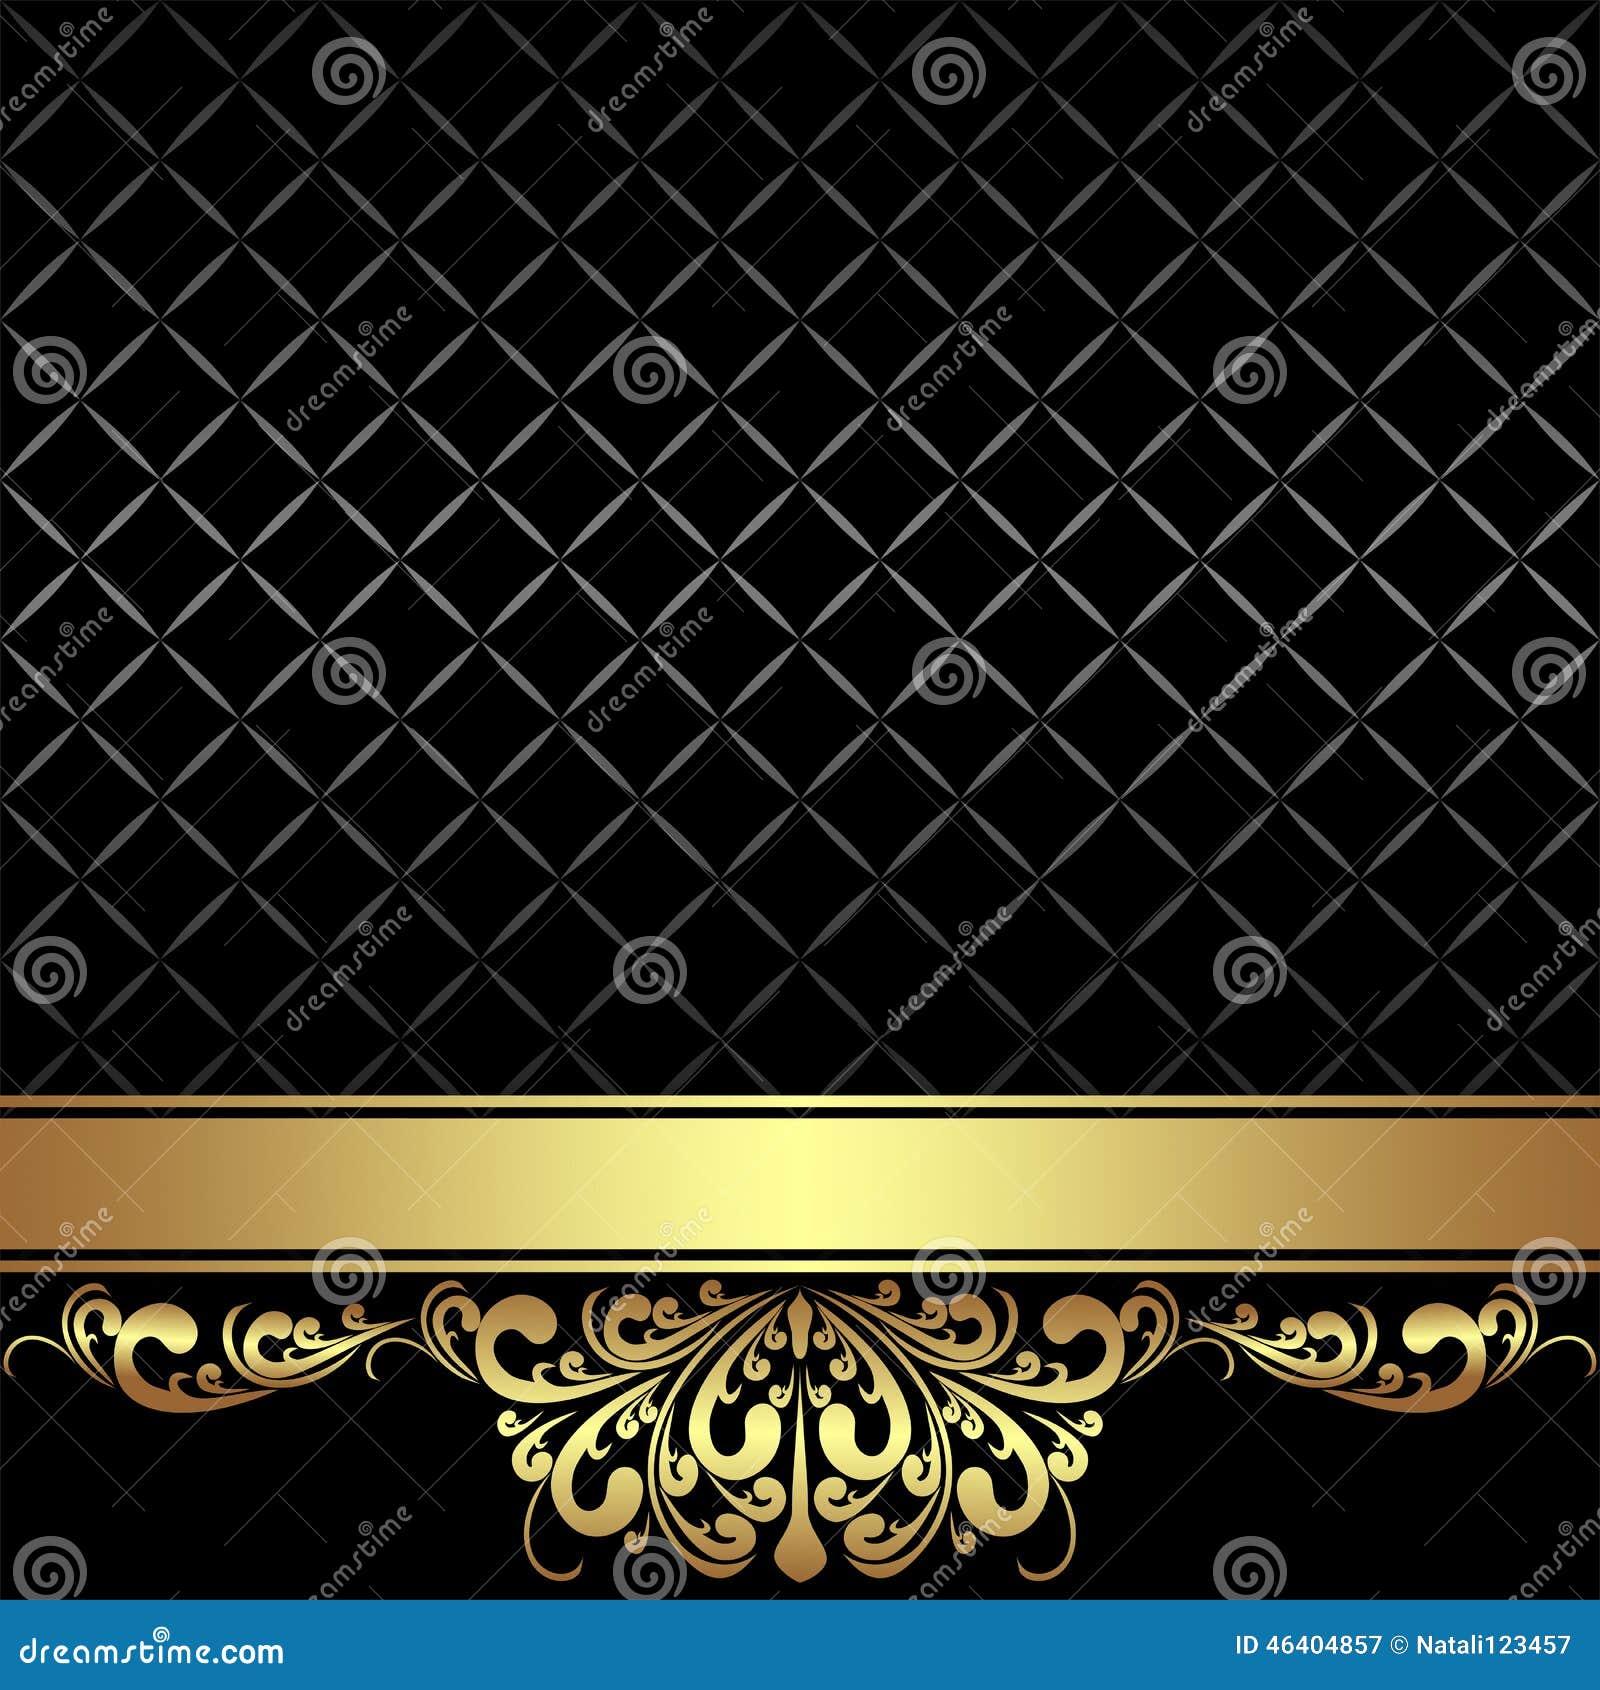 Elegant Black Background With Golden Ribbon Stock Vector